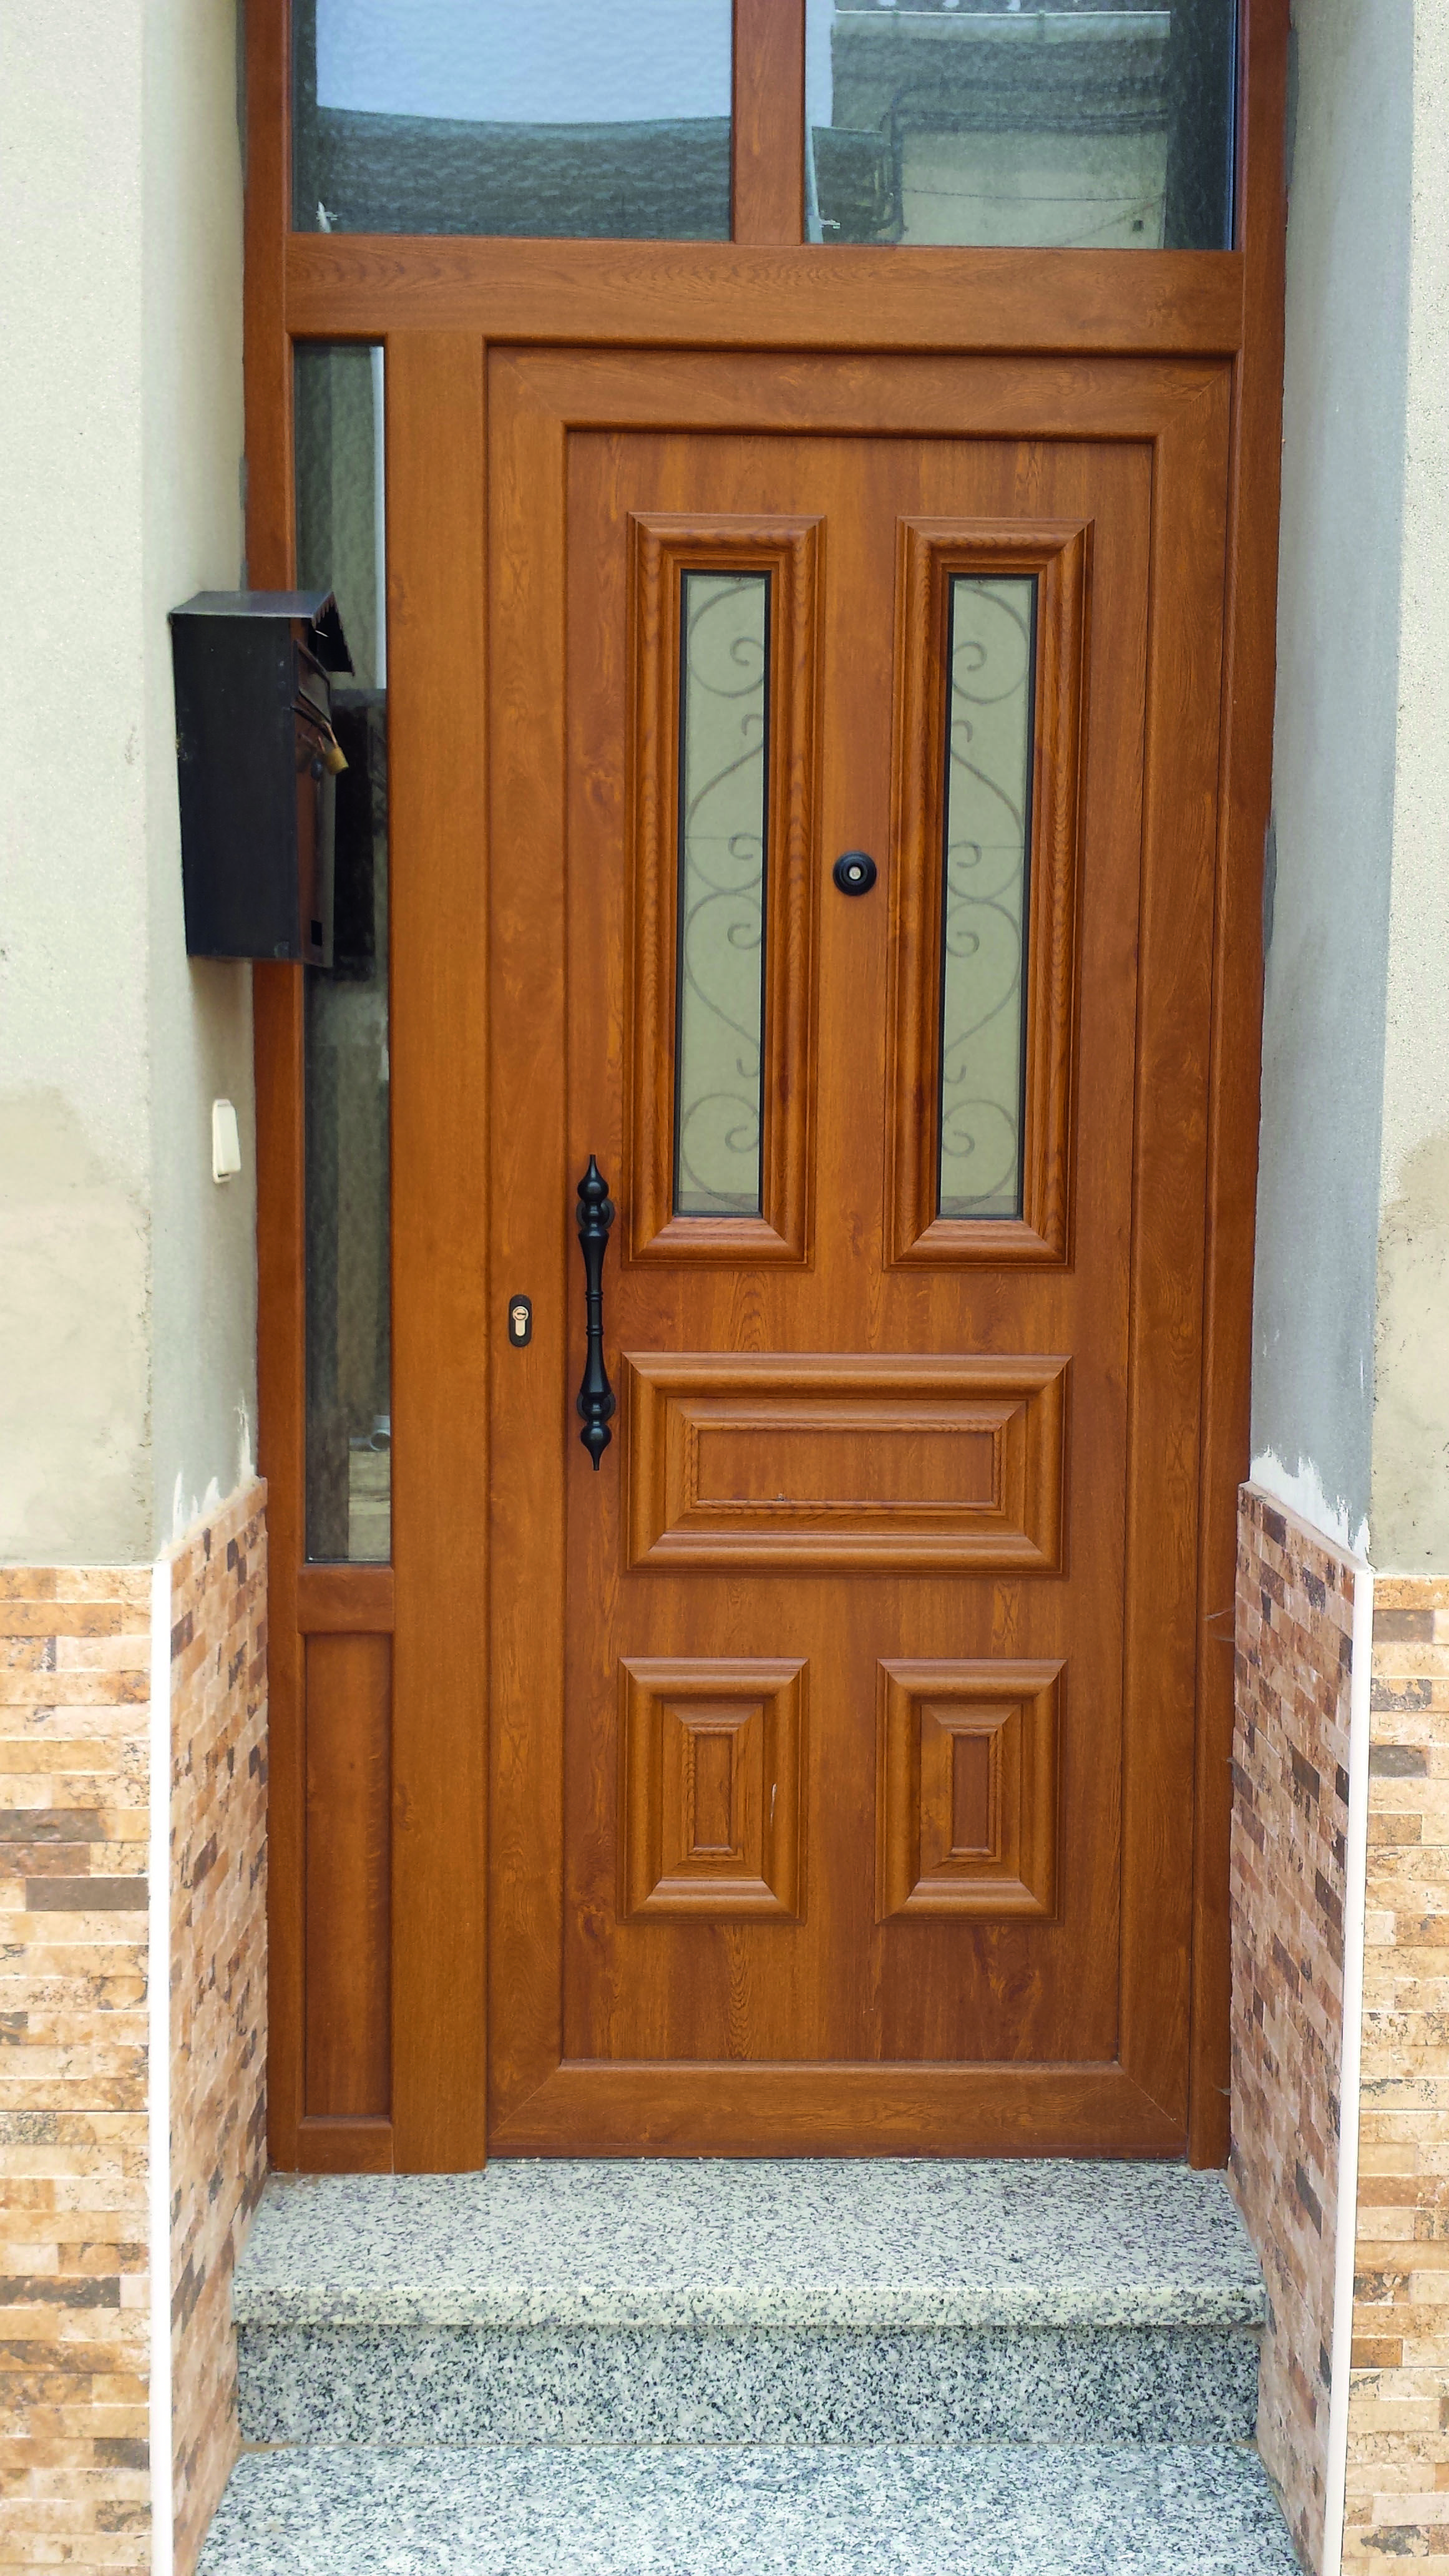 Antiga r stica 6 indupanel paneles puertas antiga for Puertas de madera para casas de campo